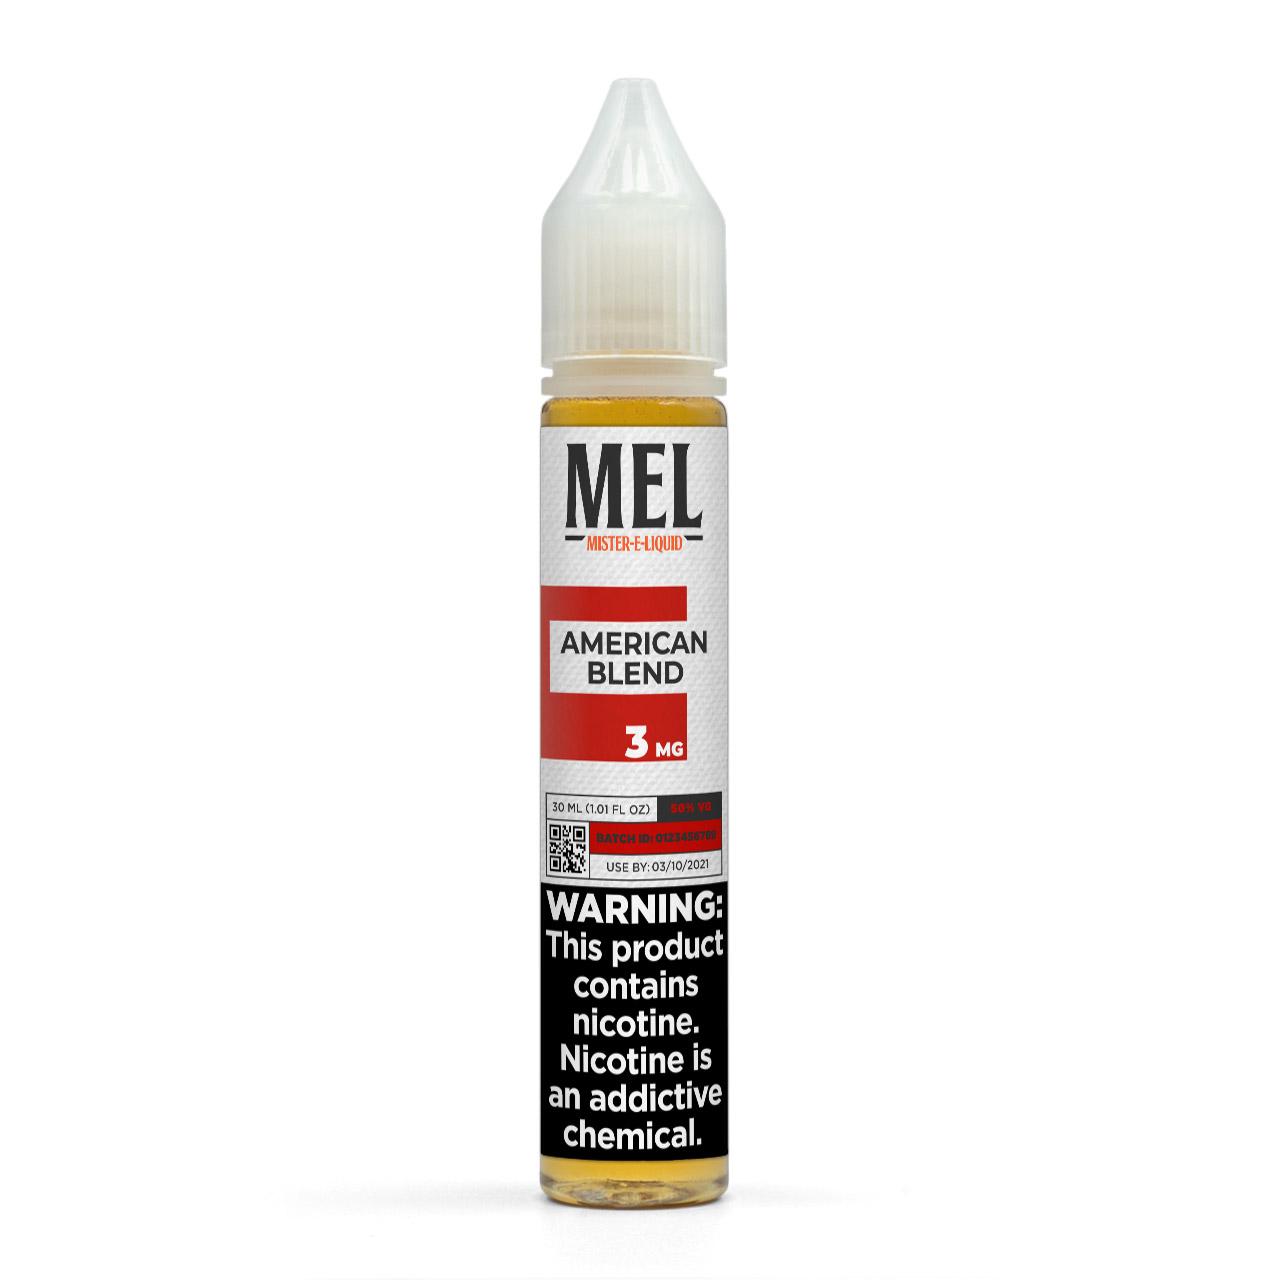 MEL American Blend Vape Juice, 3 mg